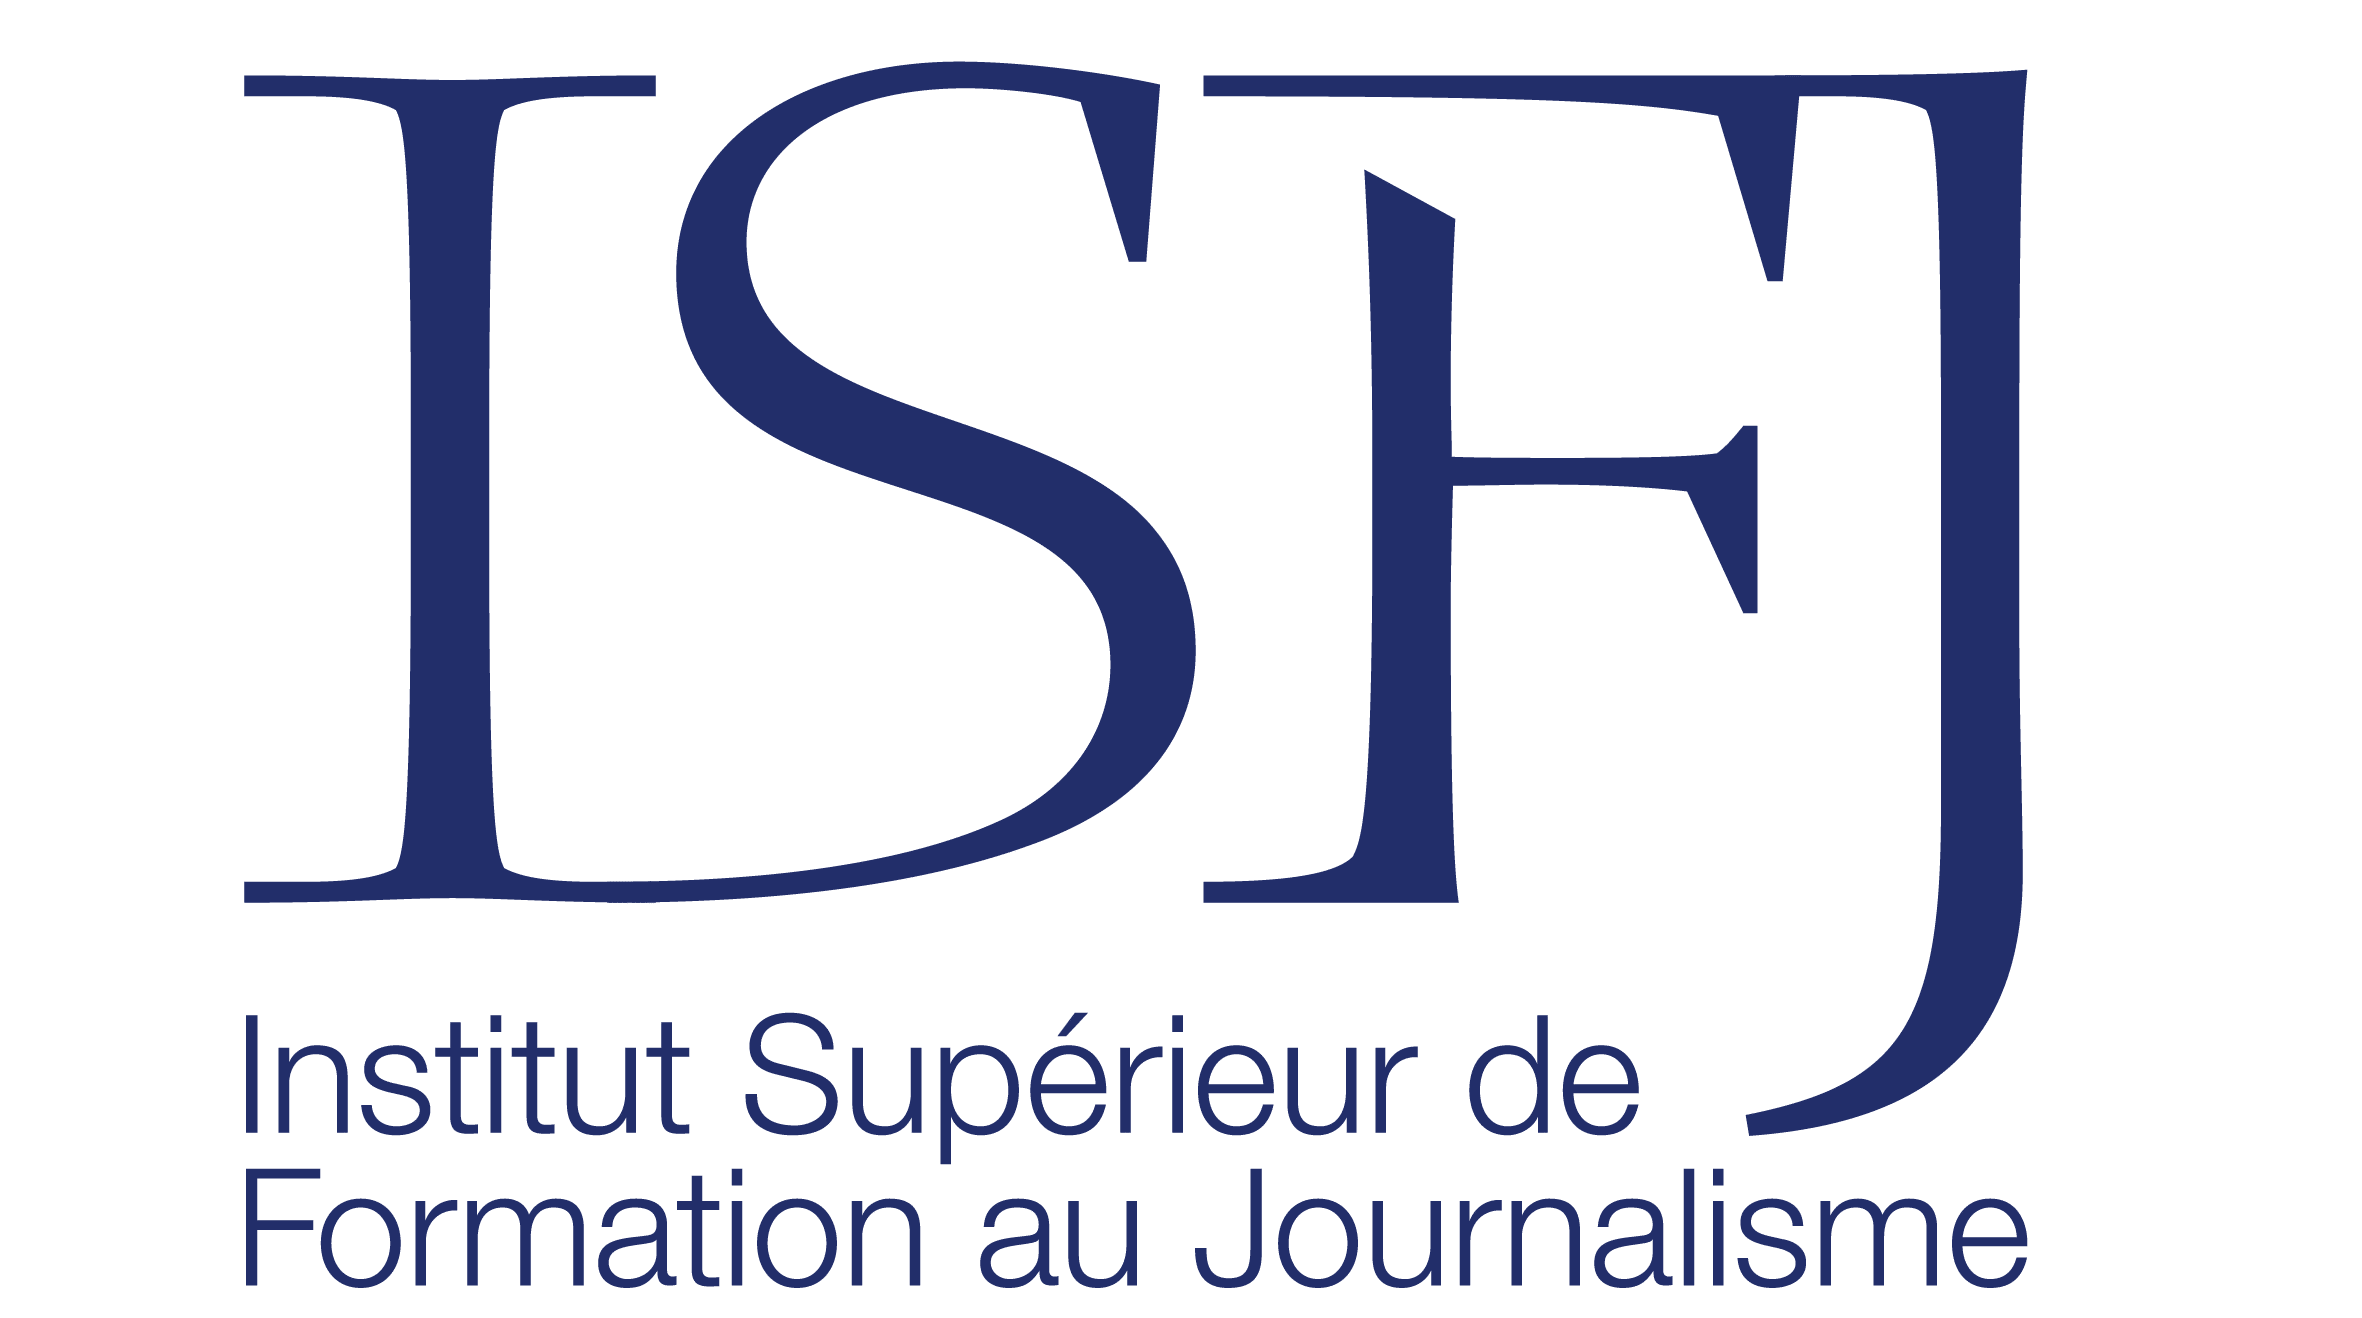 ISFJ Paris